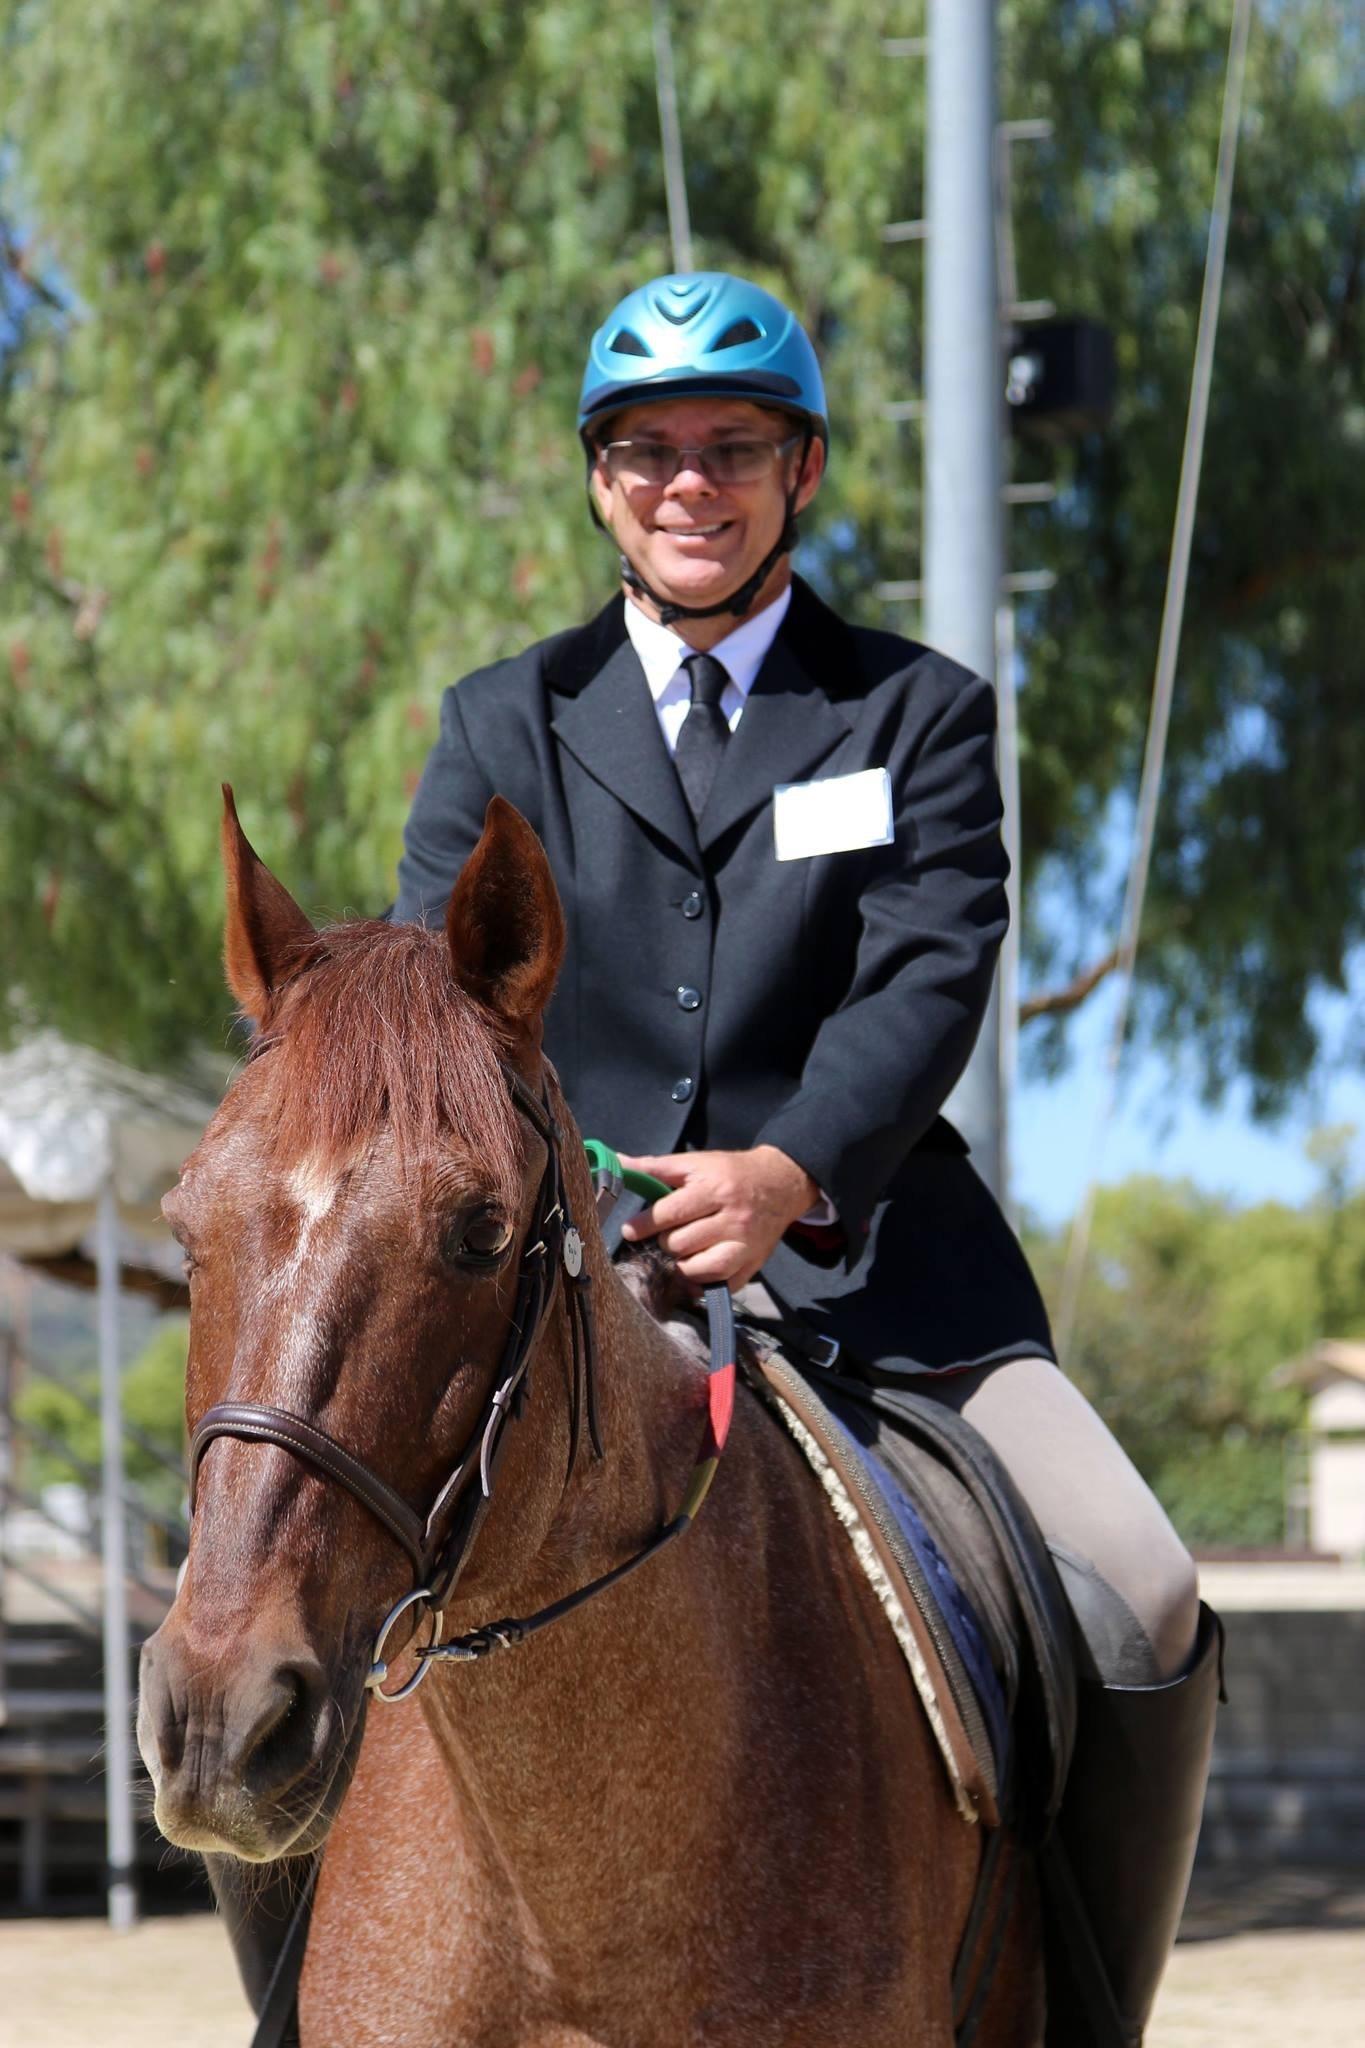 Equitation!